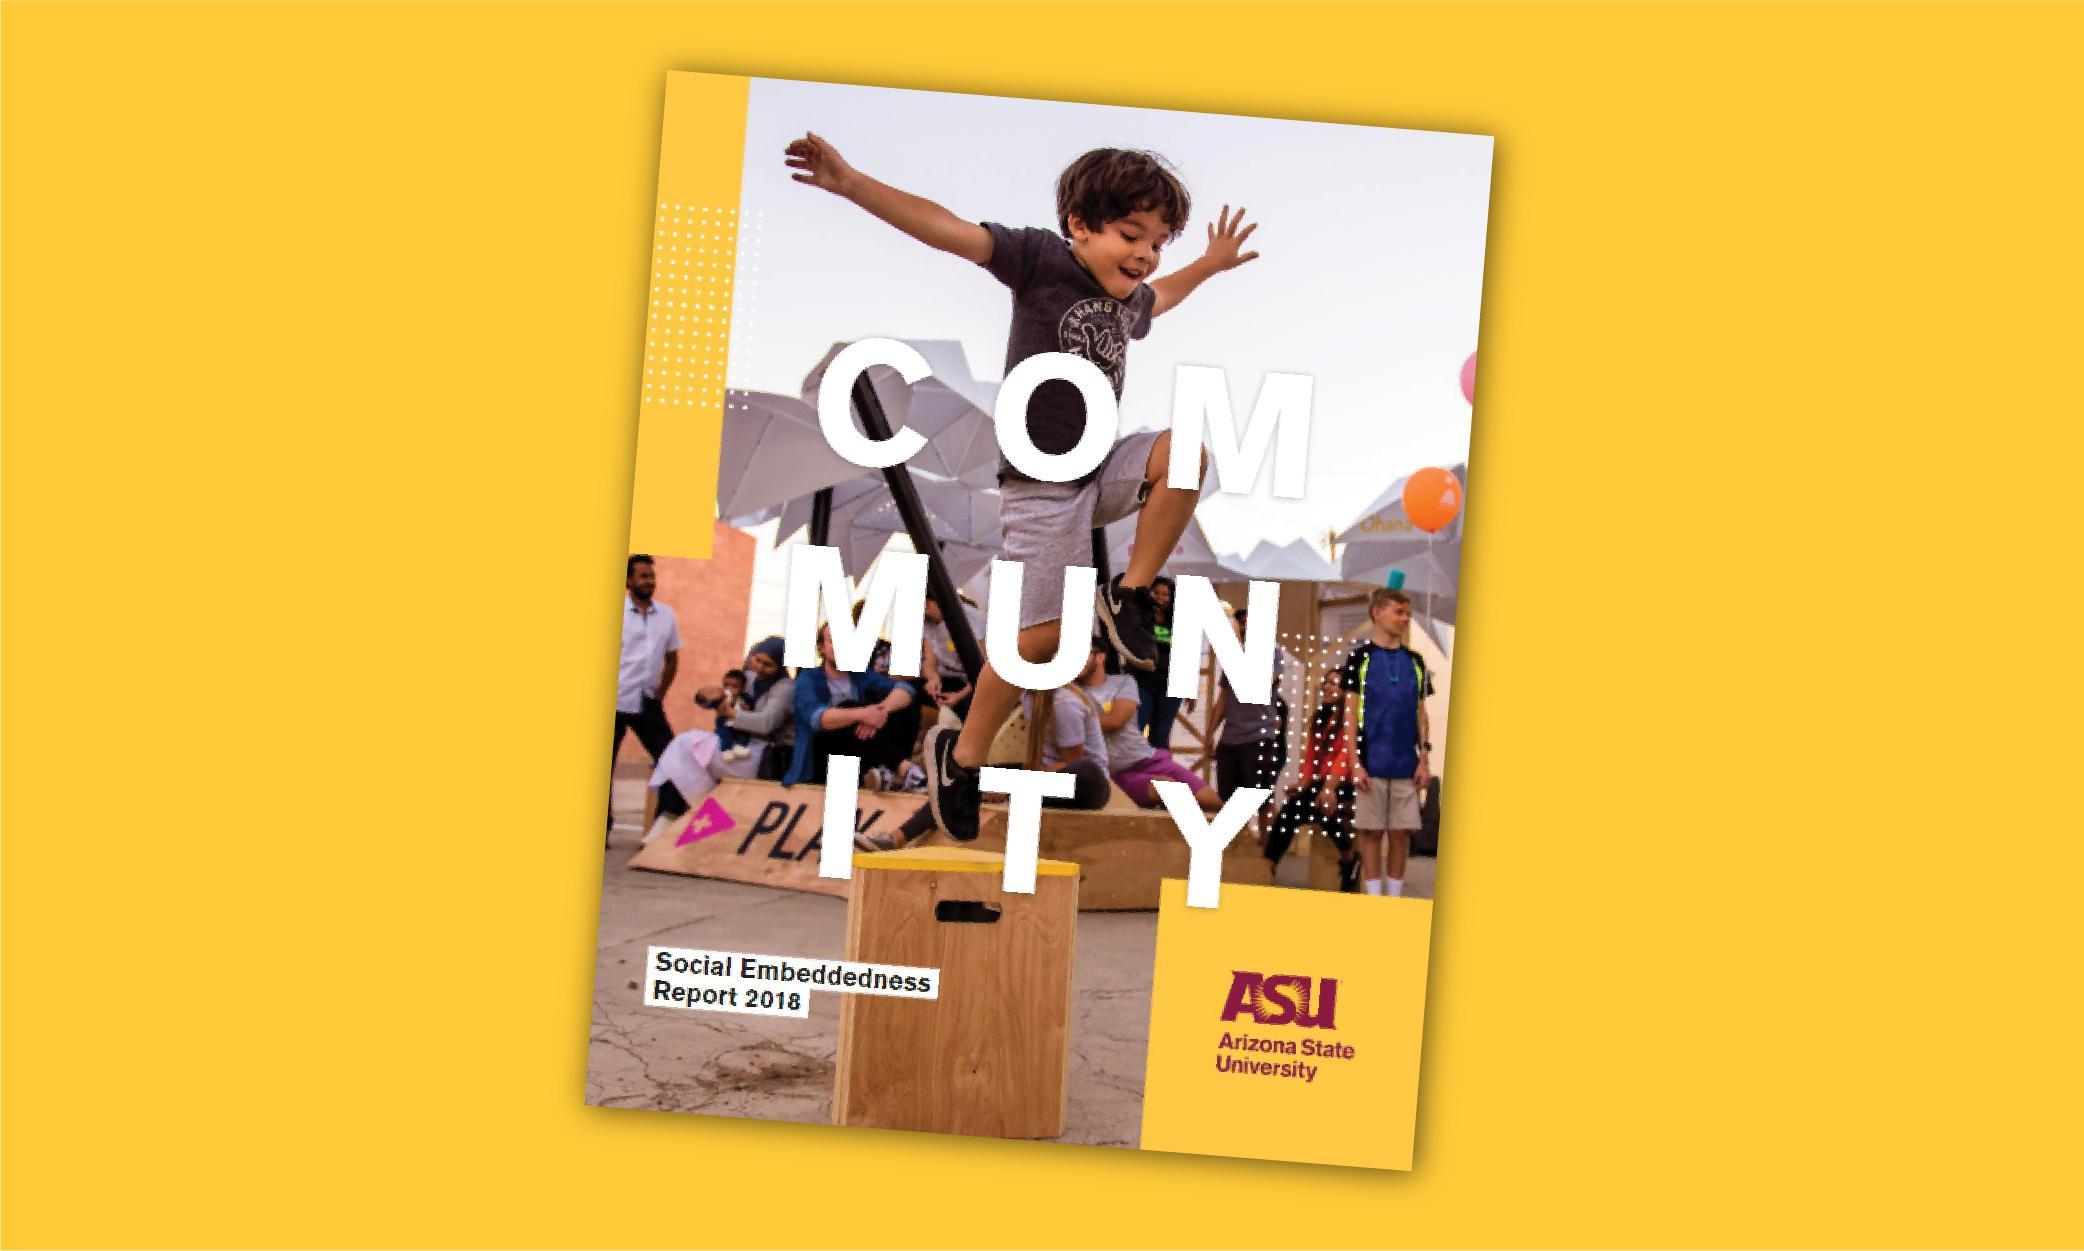 2018 Social Embeddedness Report